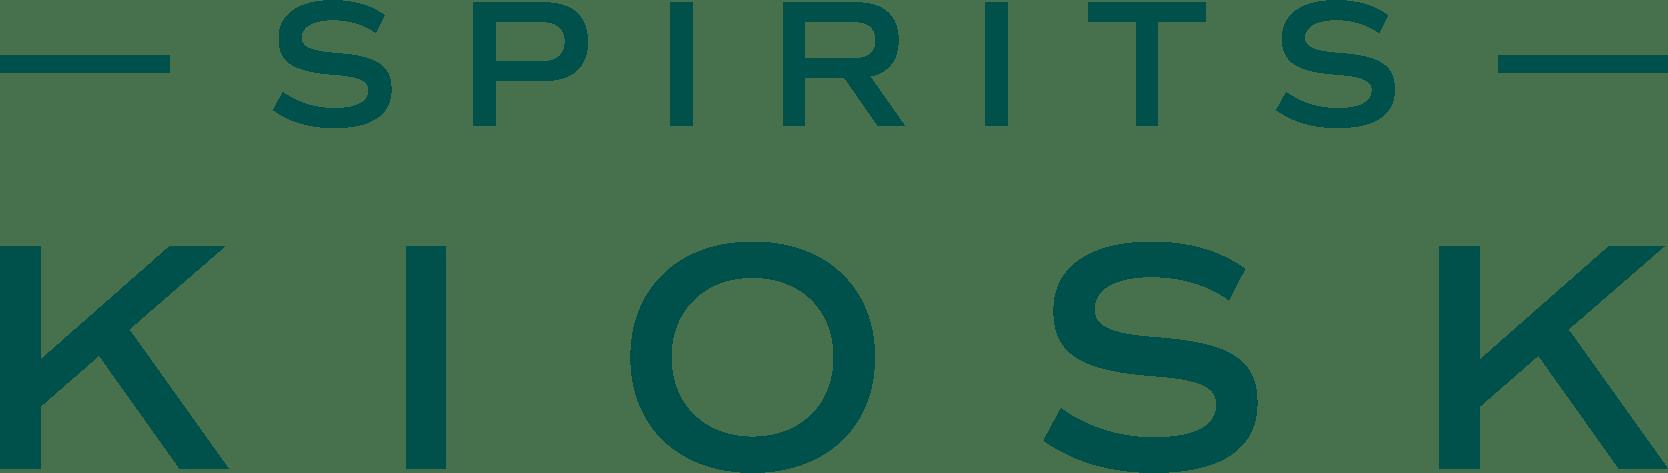 imgspiritskiosk-logo-rgb-3-1603731445743